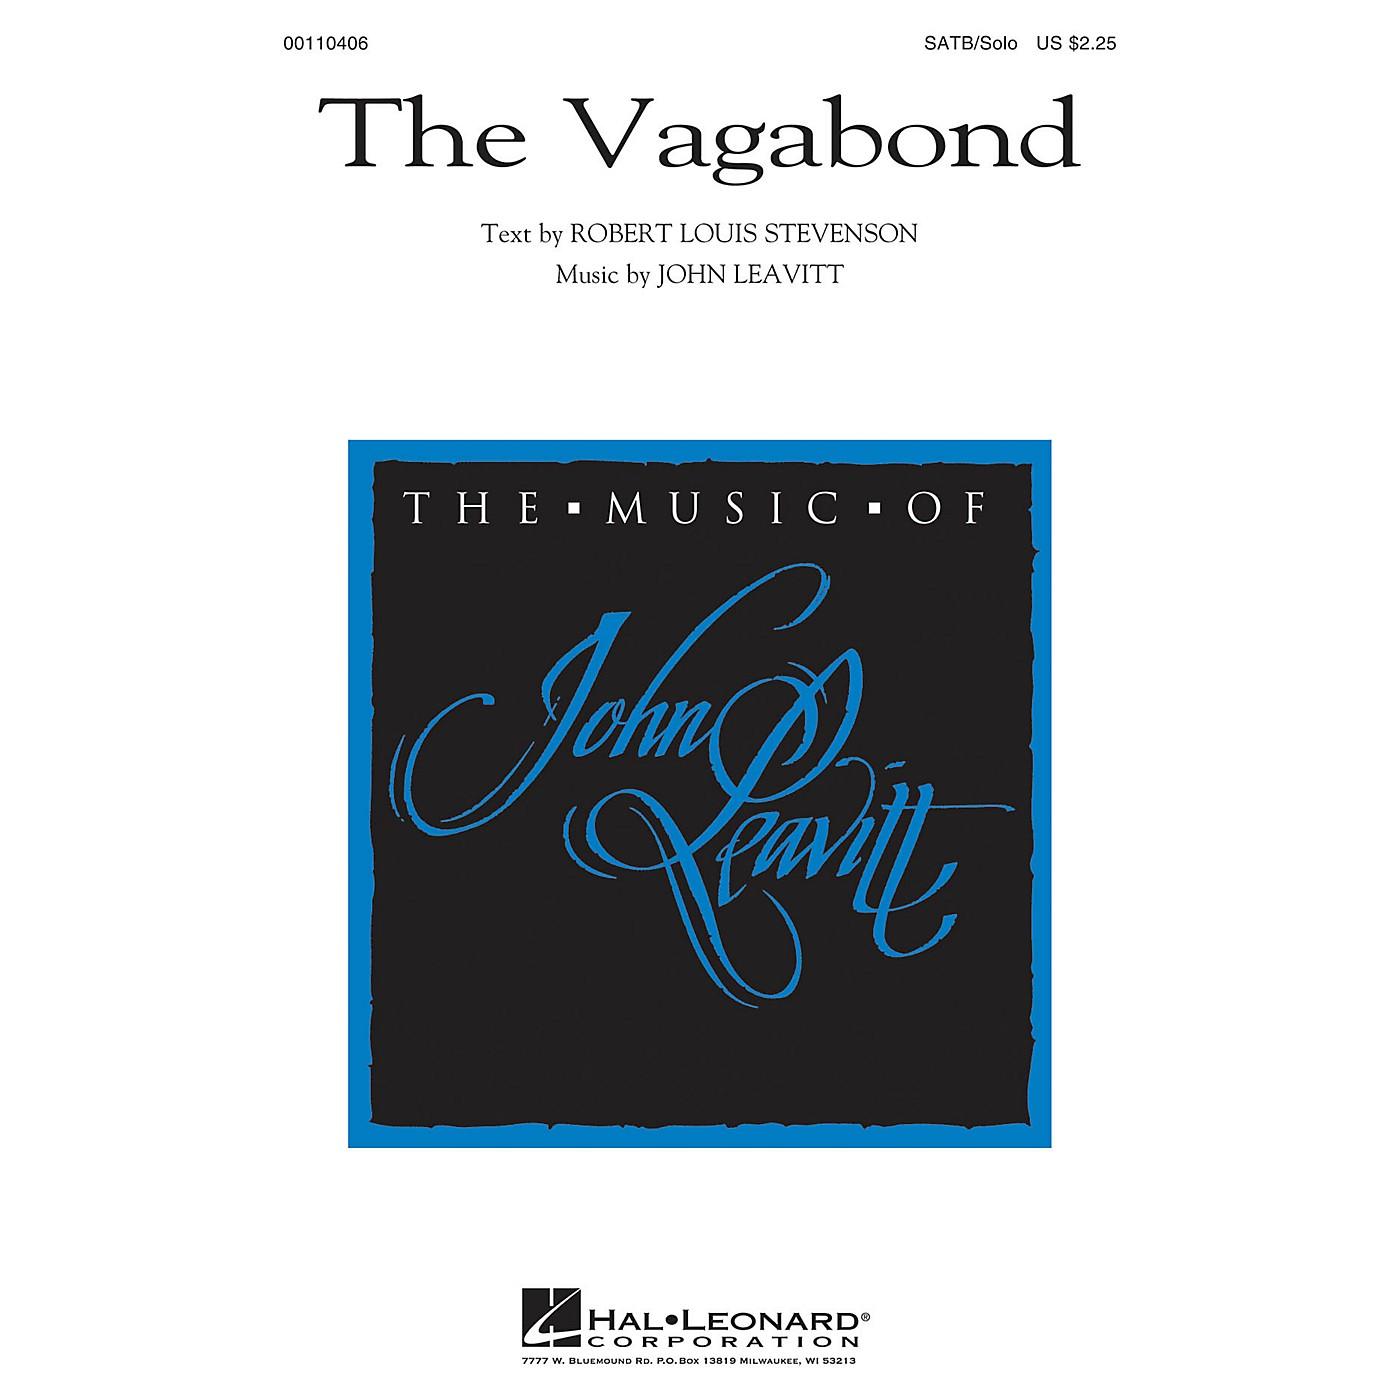 Hal Leonard The Vagabond SATB Chorus and Solo composed by John Leavitt thumbnail